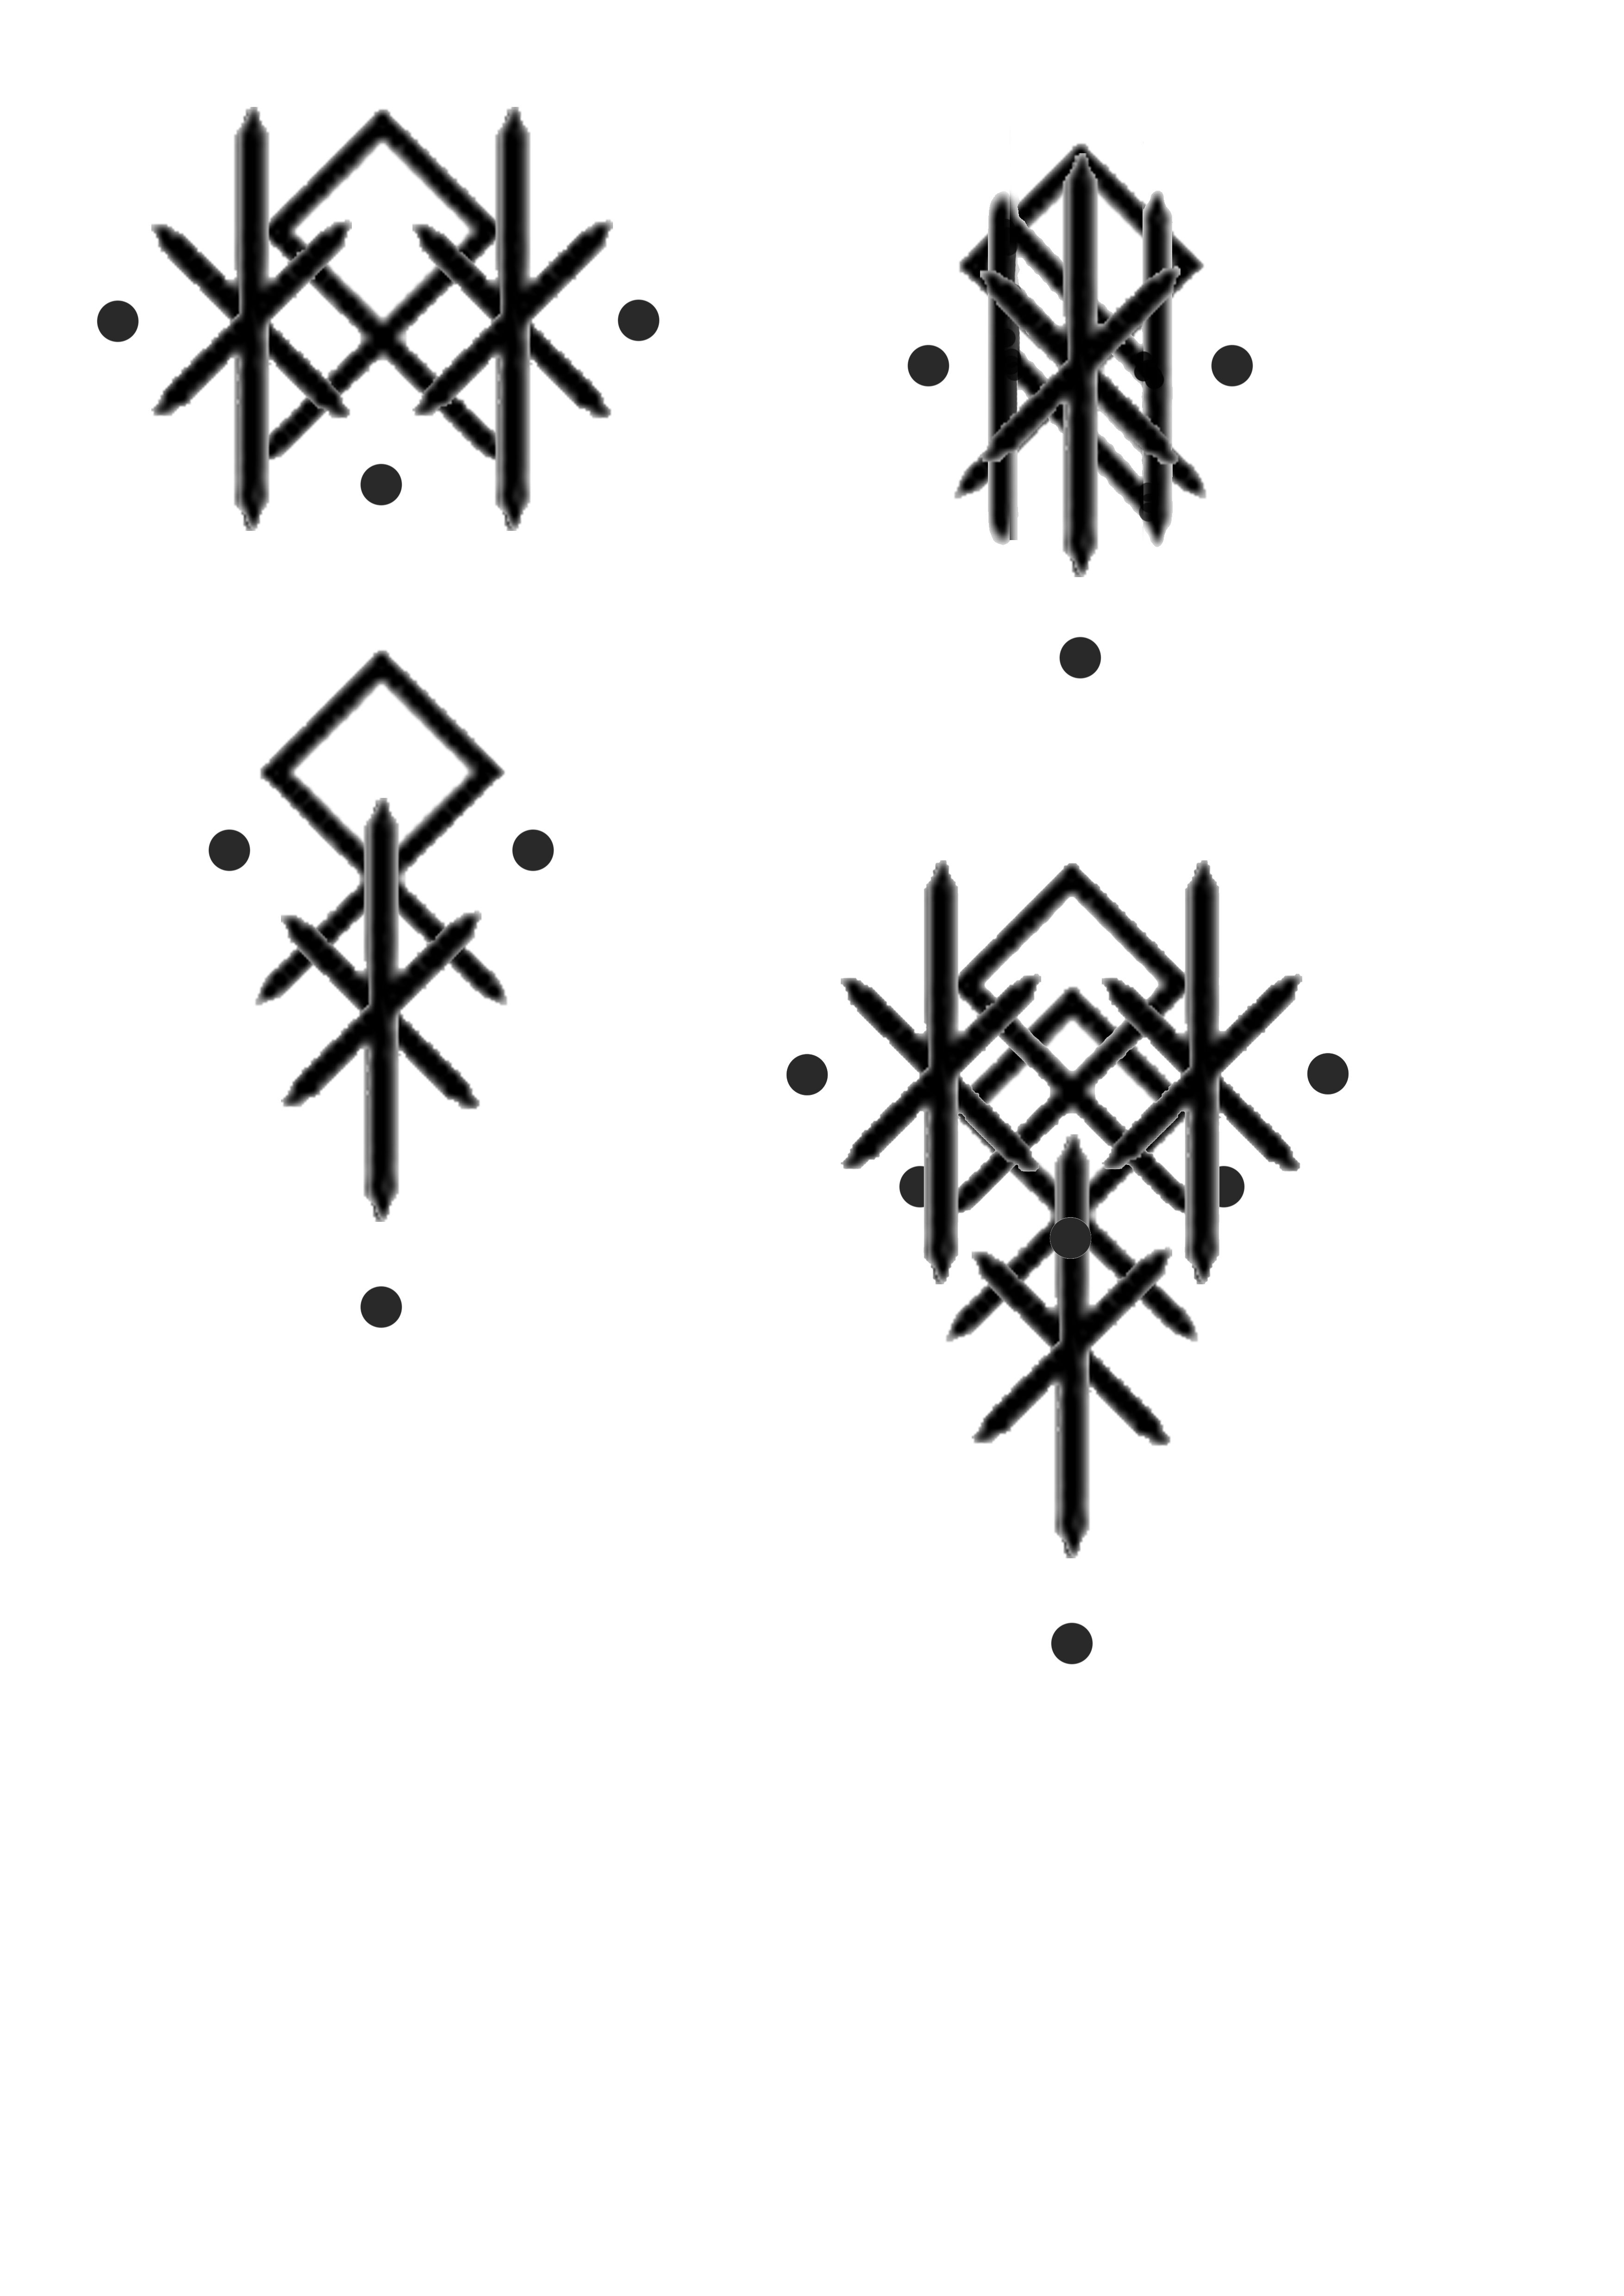 Bind runes for family, happy family | Rune tattoo, Norse ...Norse Viking Rune Symbols Tattoos